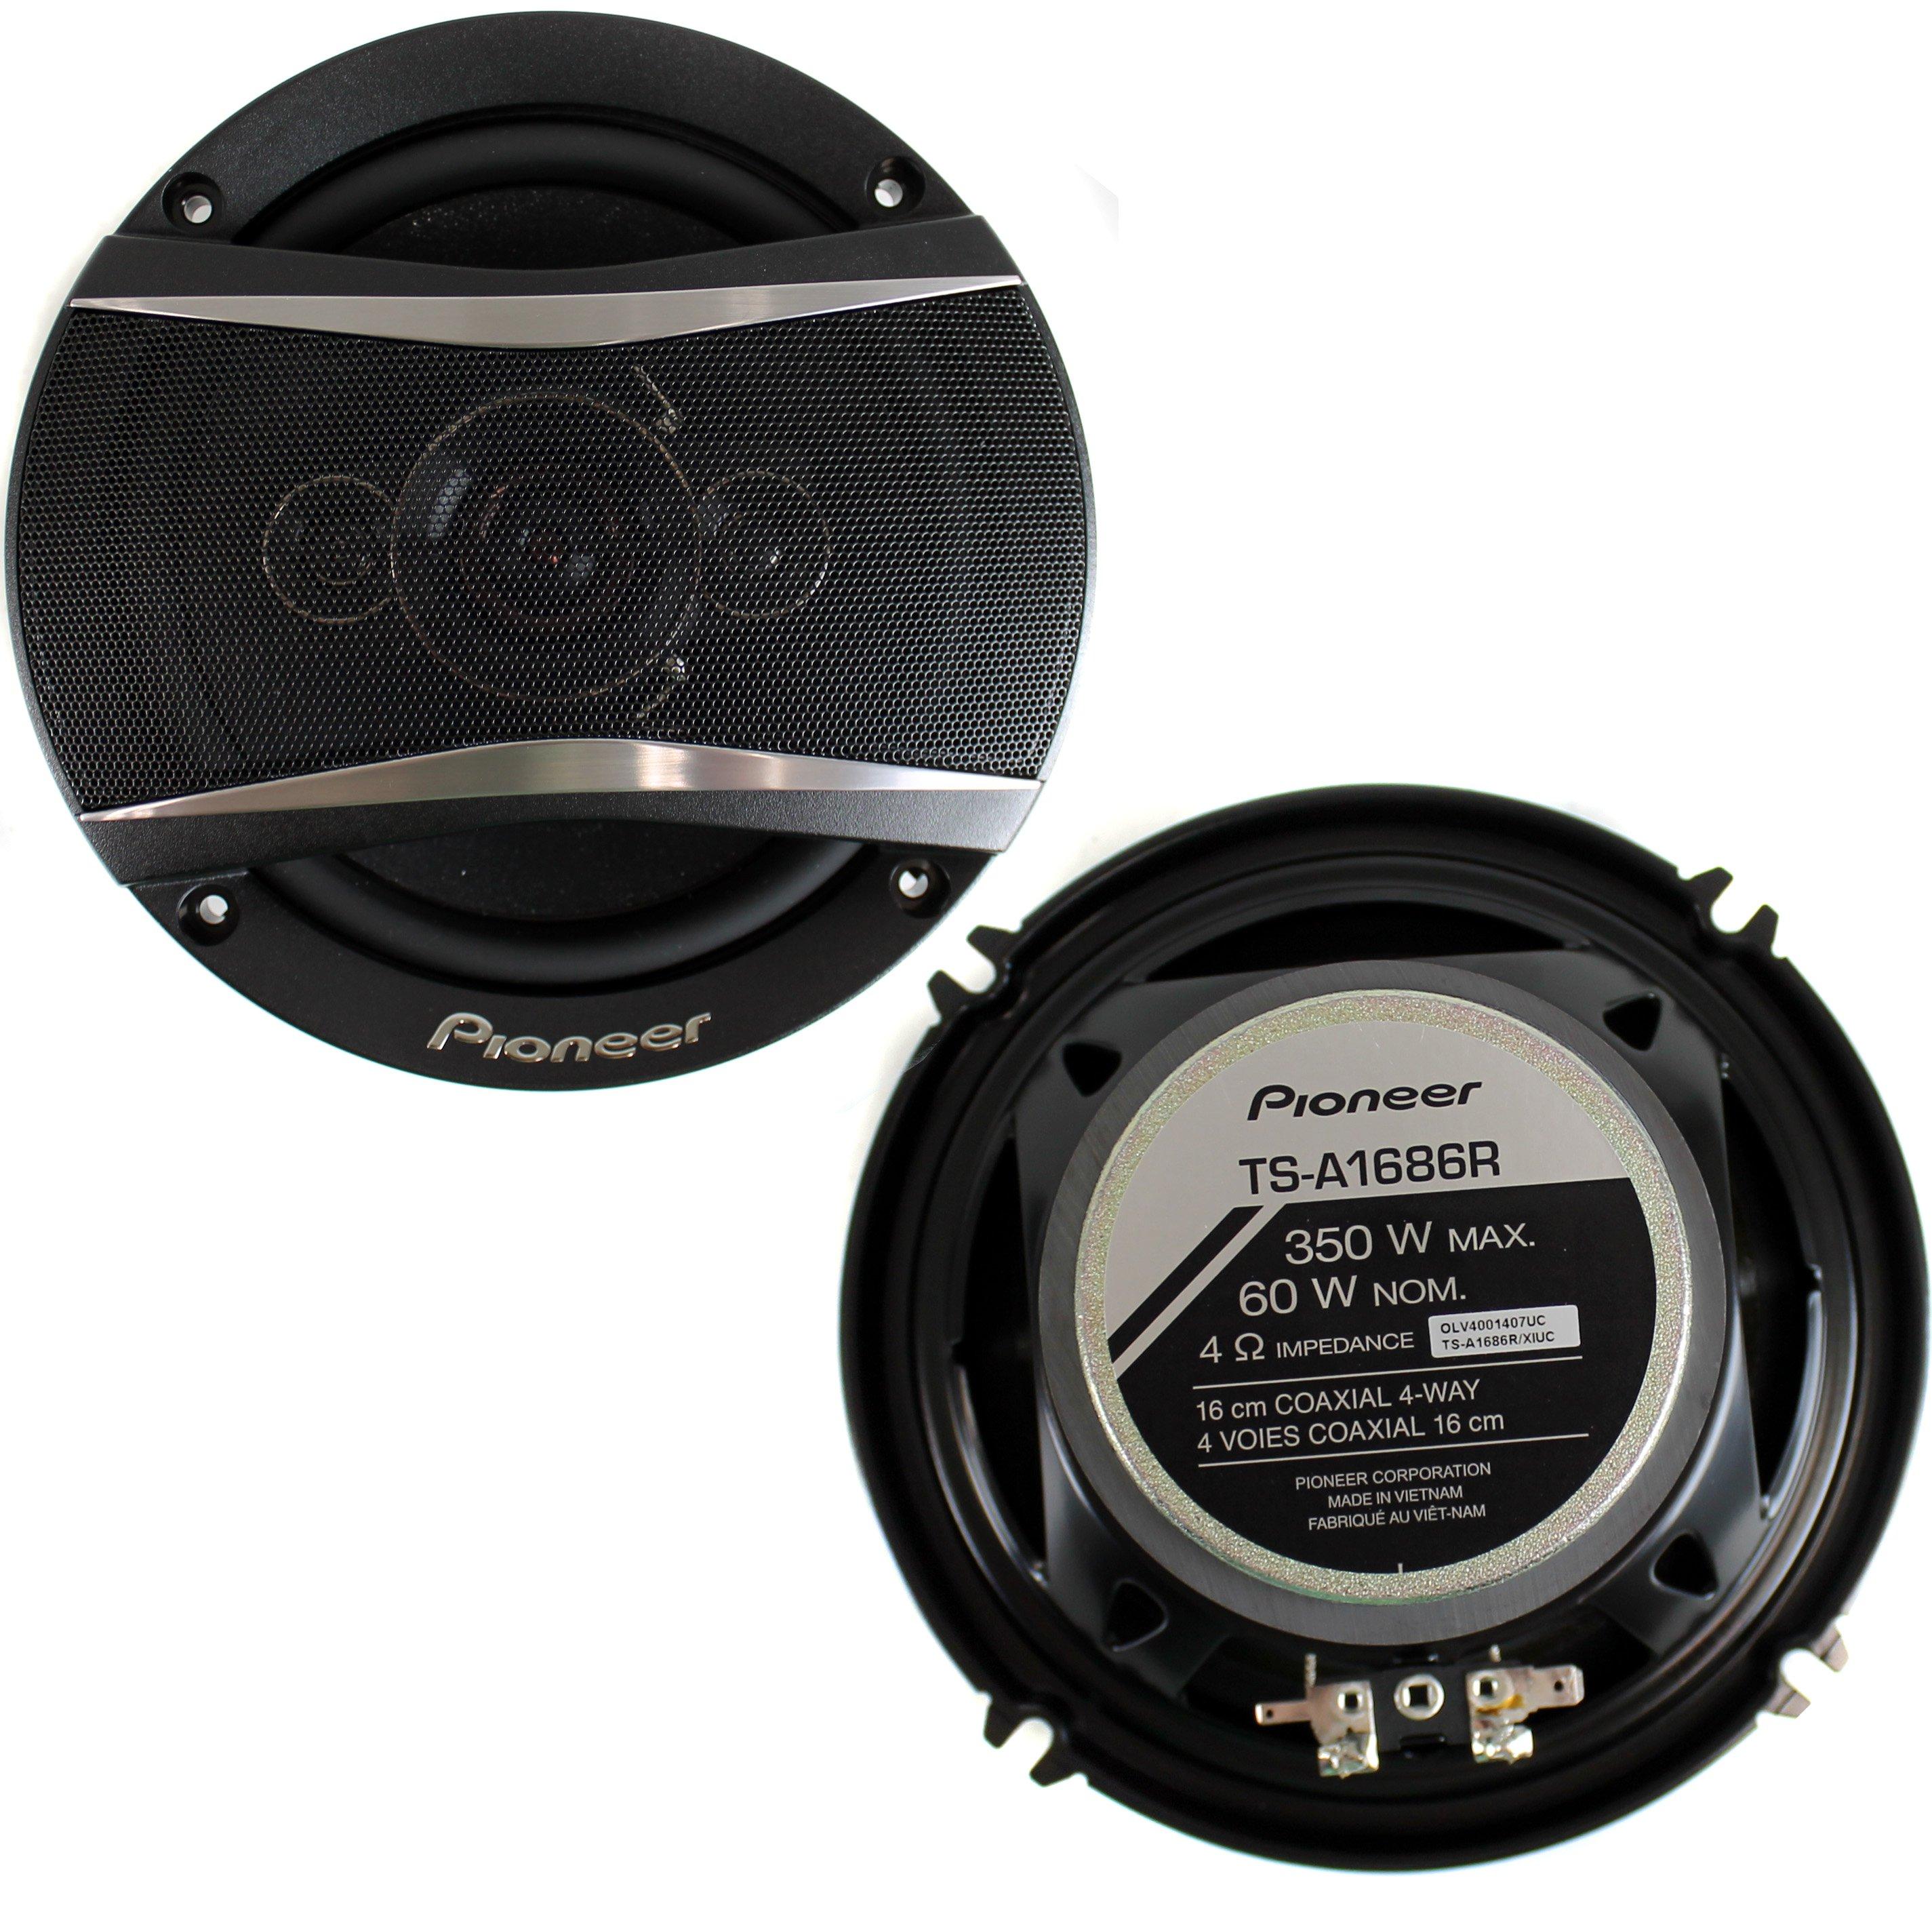 2) Pioneer 6.5 Inch 4-Way 350 Watt Coaxial Black Car Speakers Pair | TS-A1686R